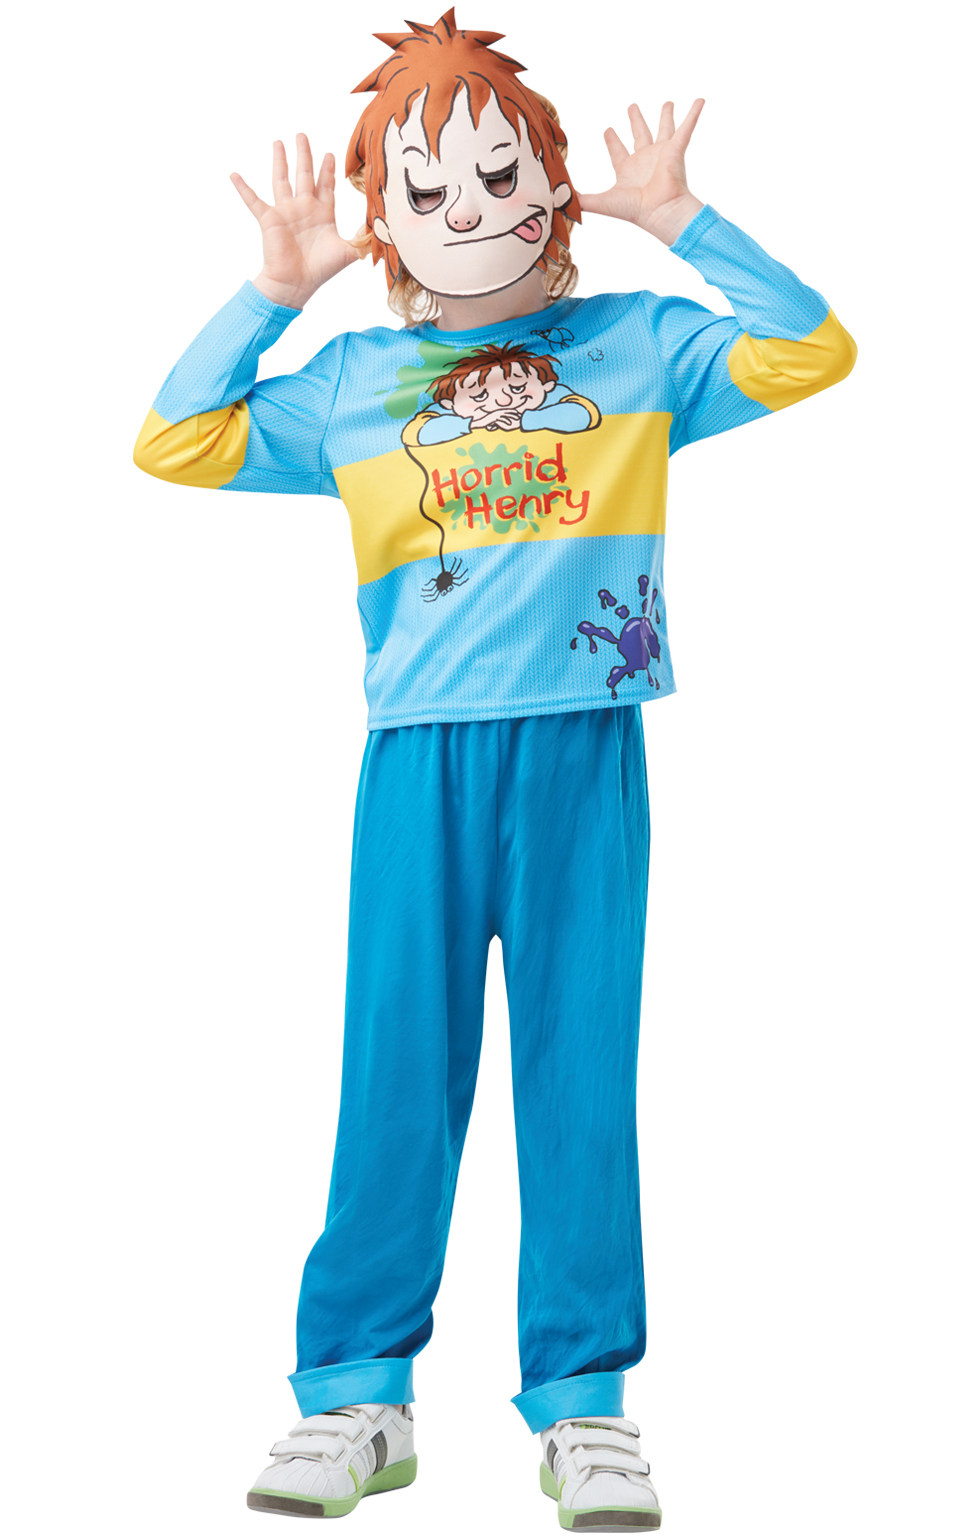 Boys Horrid Henry Costume Kids School Book Week Story Fancy Dress Outfit Thumbnail 1